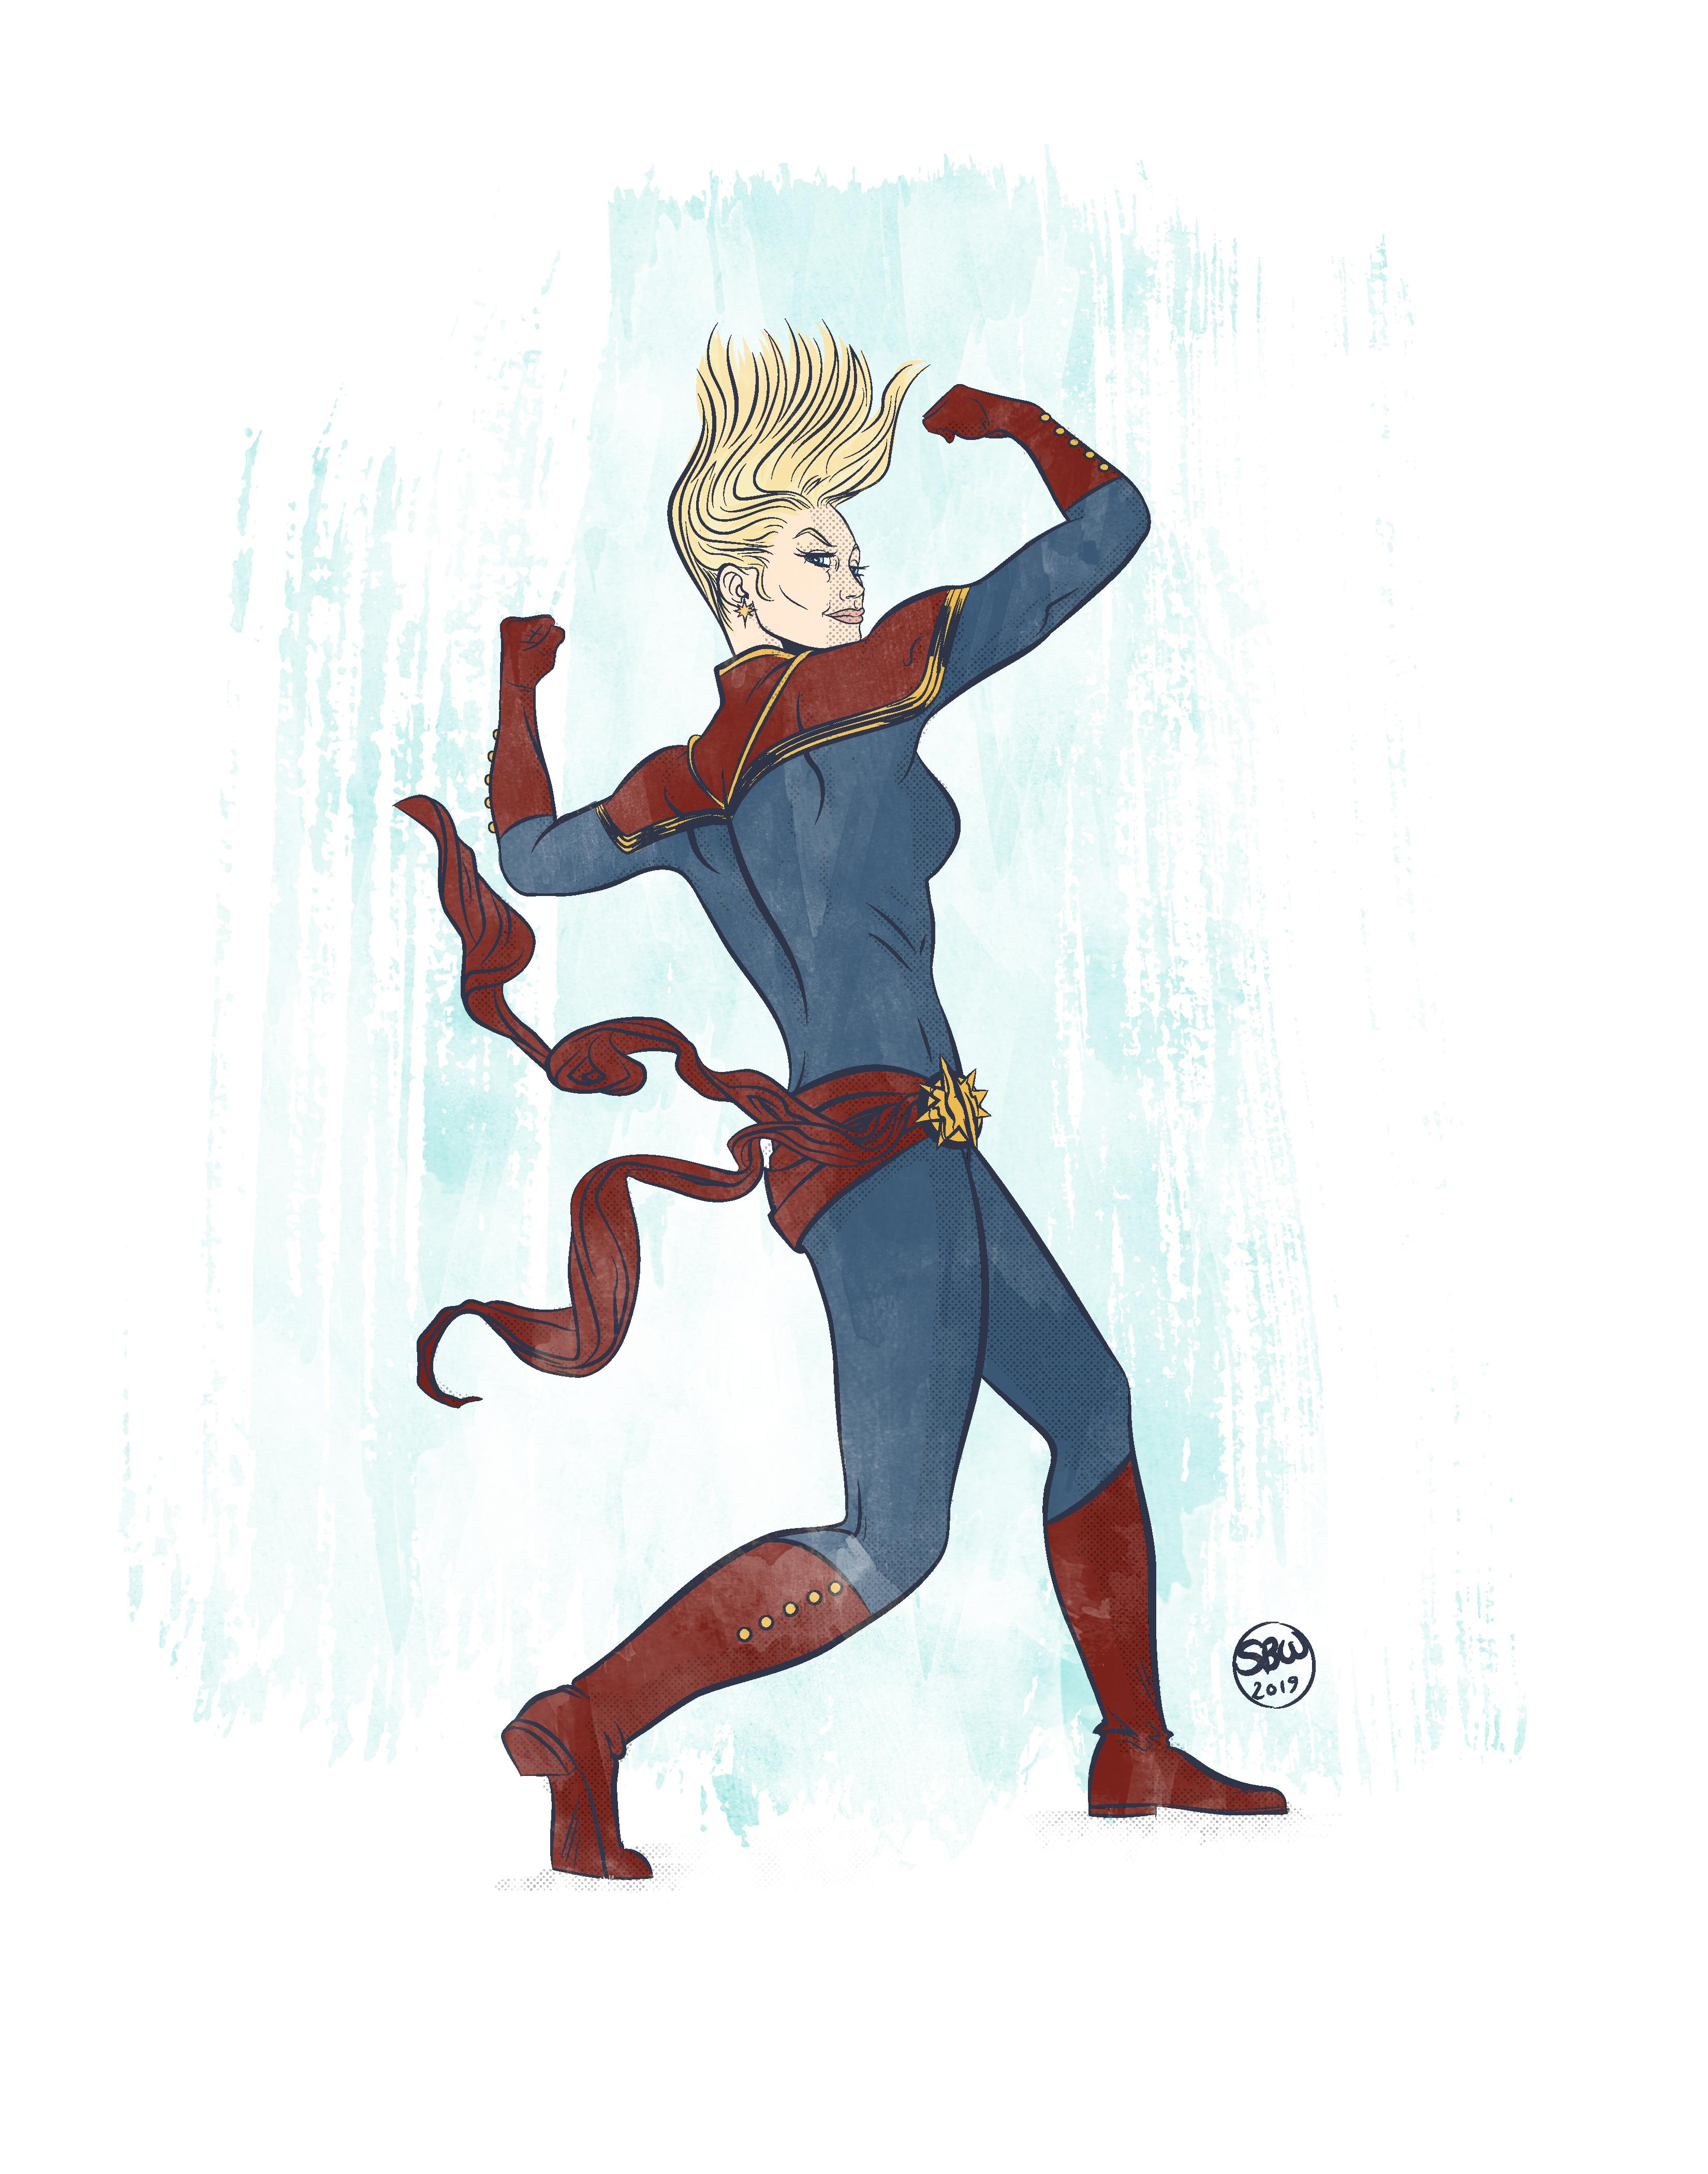 Capt_Marvel_11x14_FA